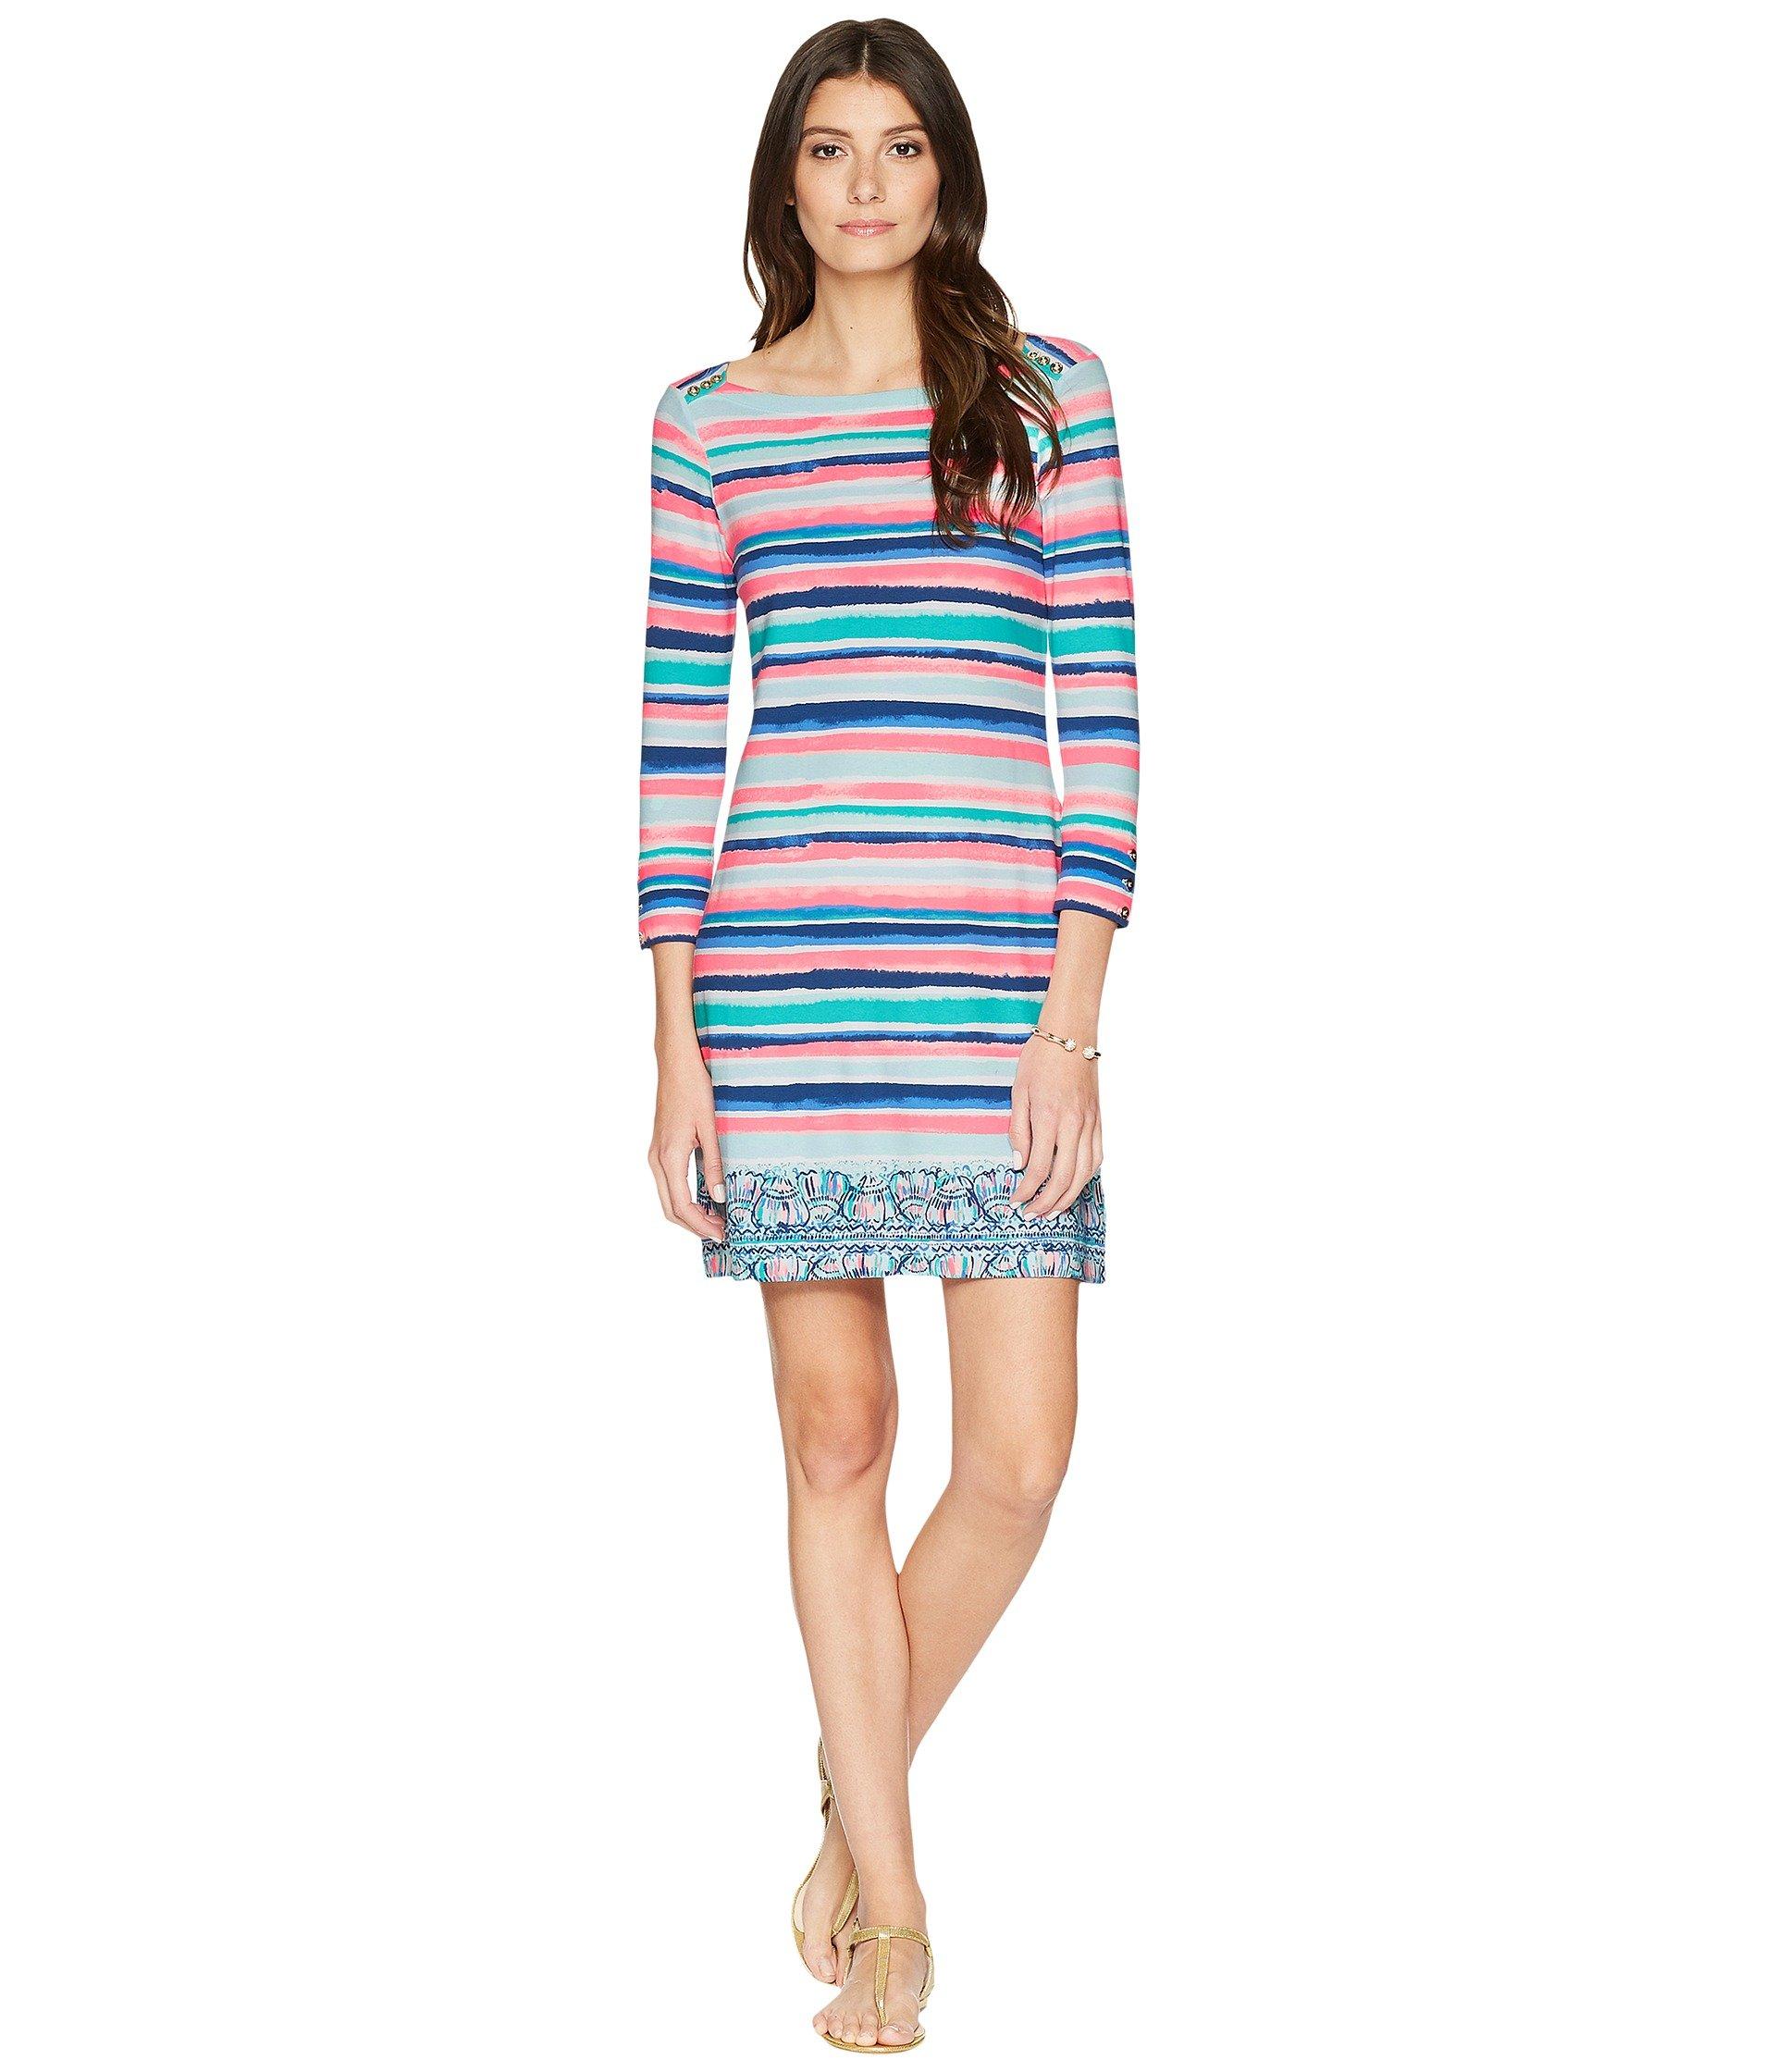 Lilly Pulitzer Women's UPF 50+ Sophie Dress, Multi Sandy Shell Stripe, L